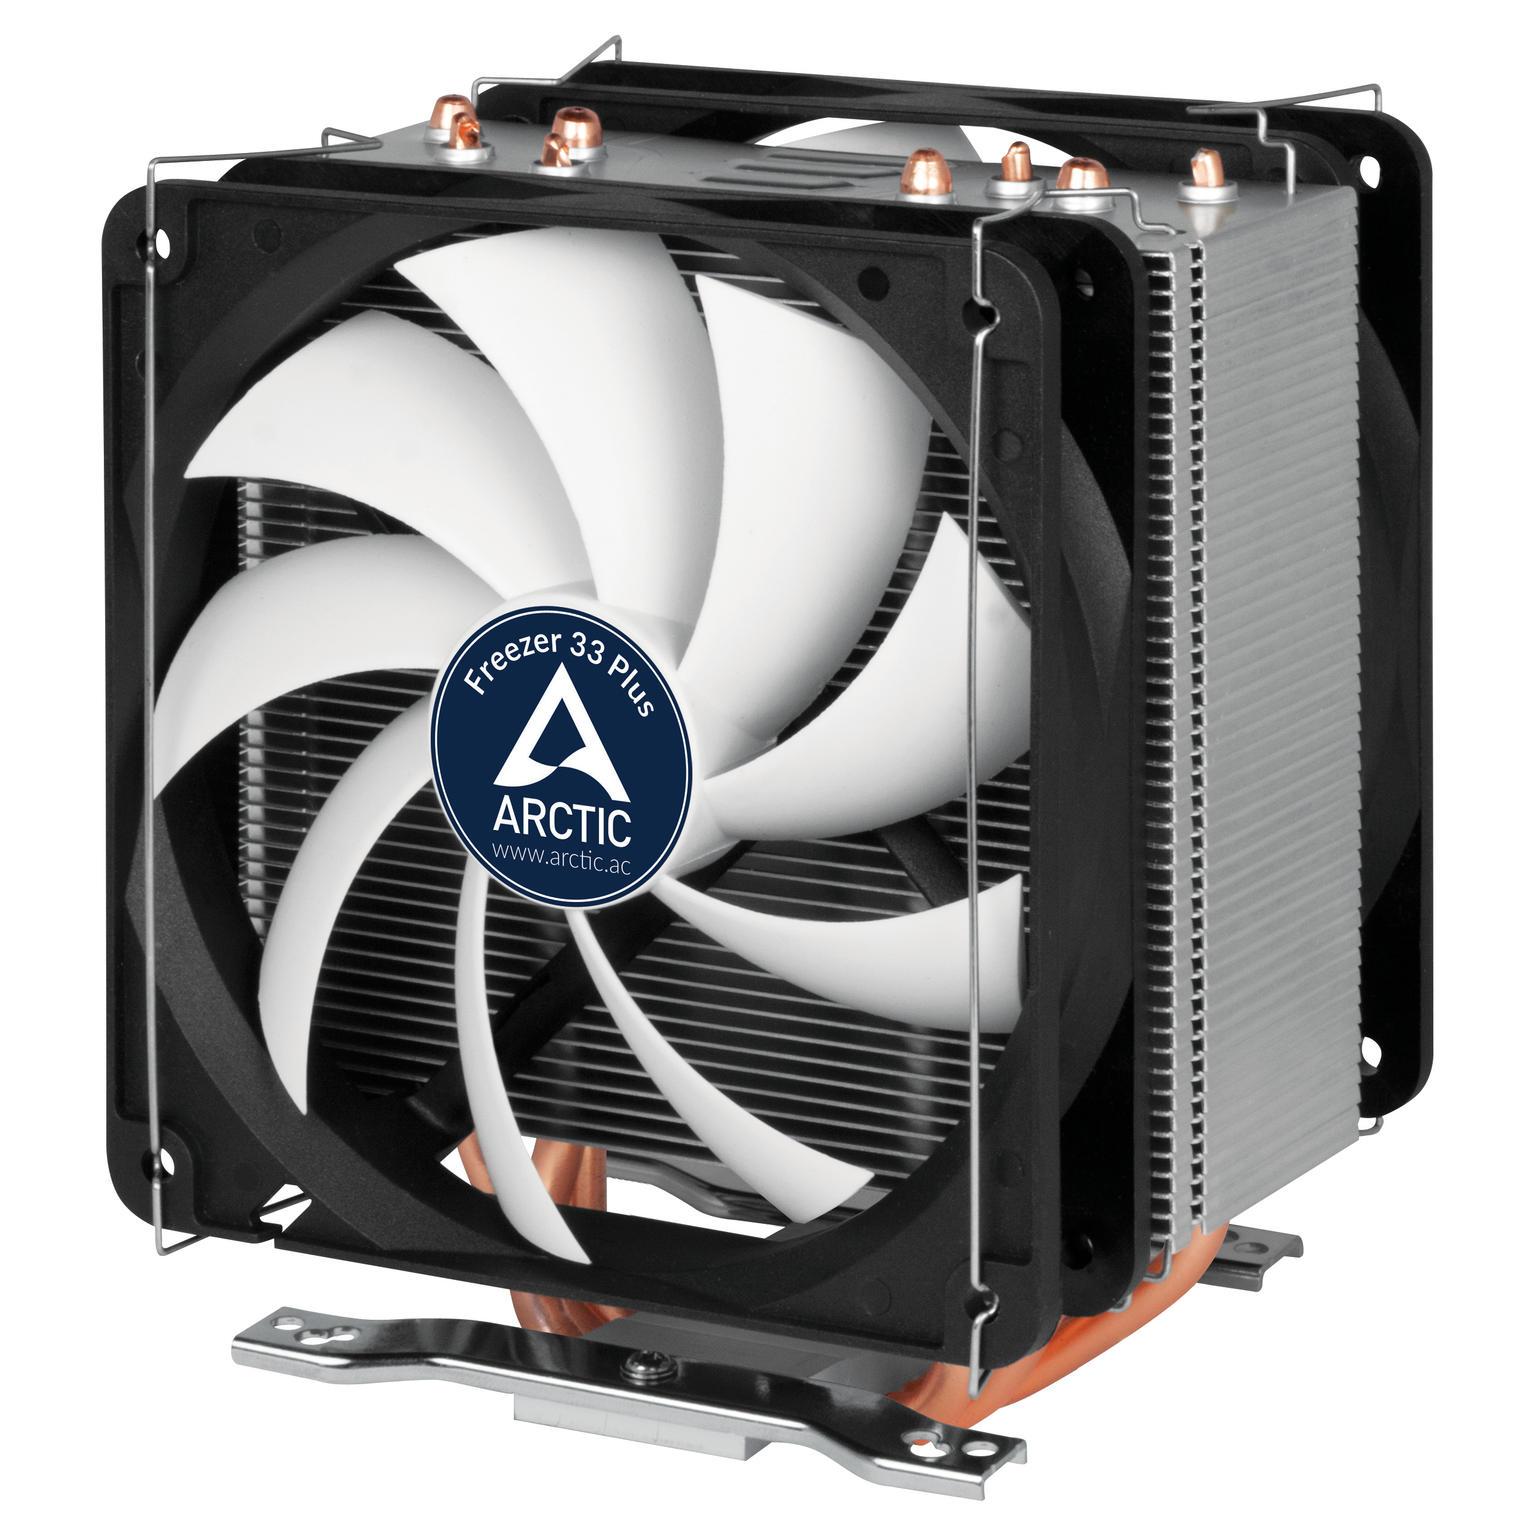 Arctic Freezer 33 Plus